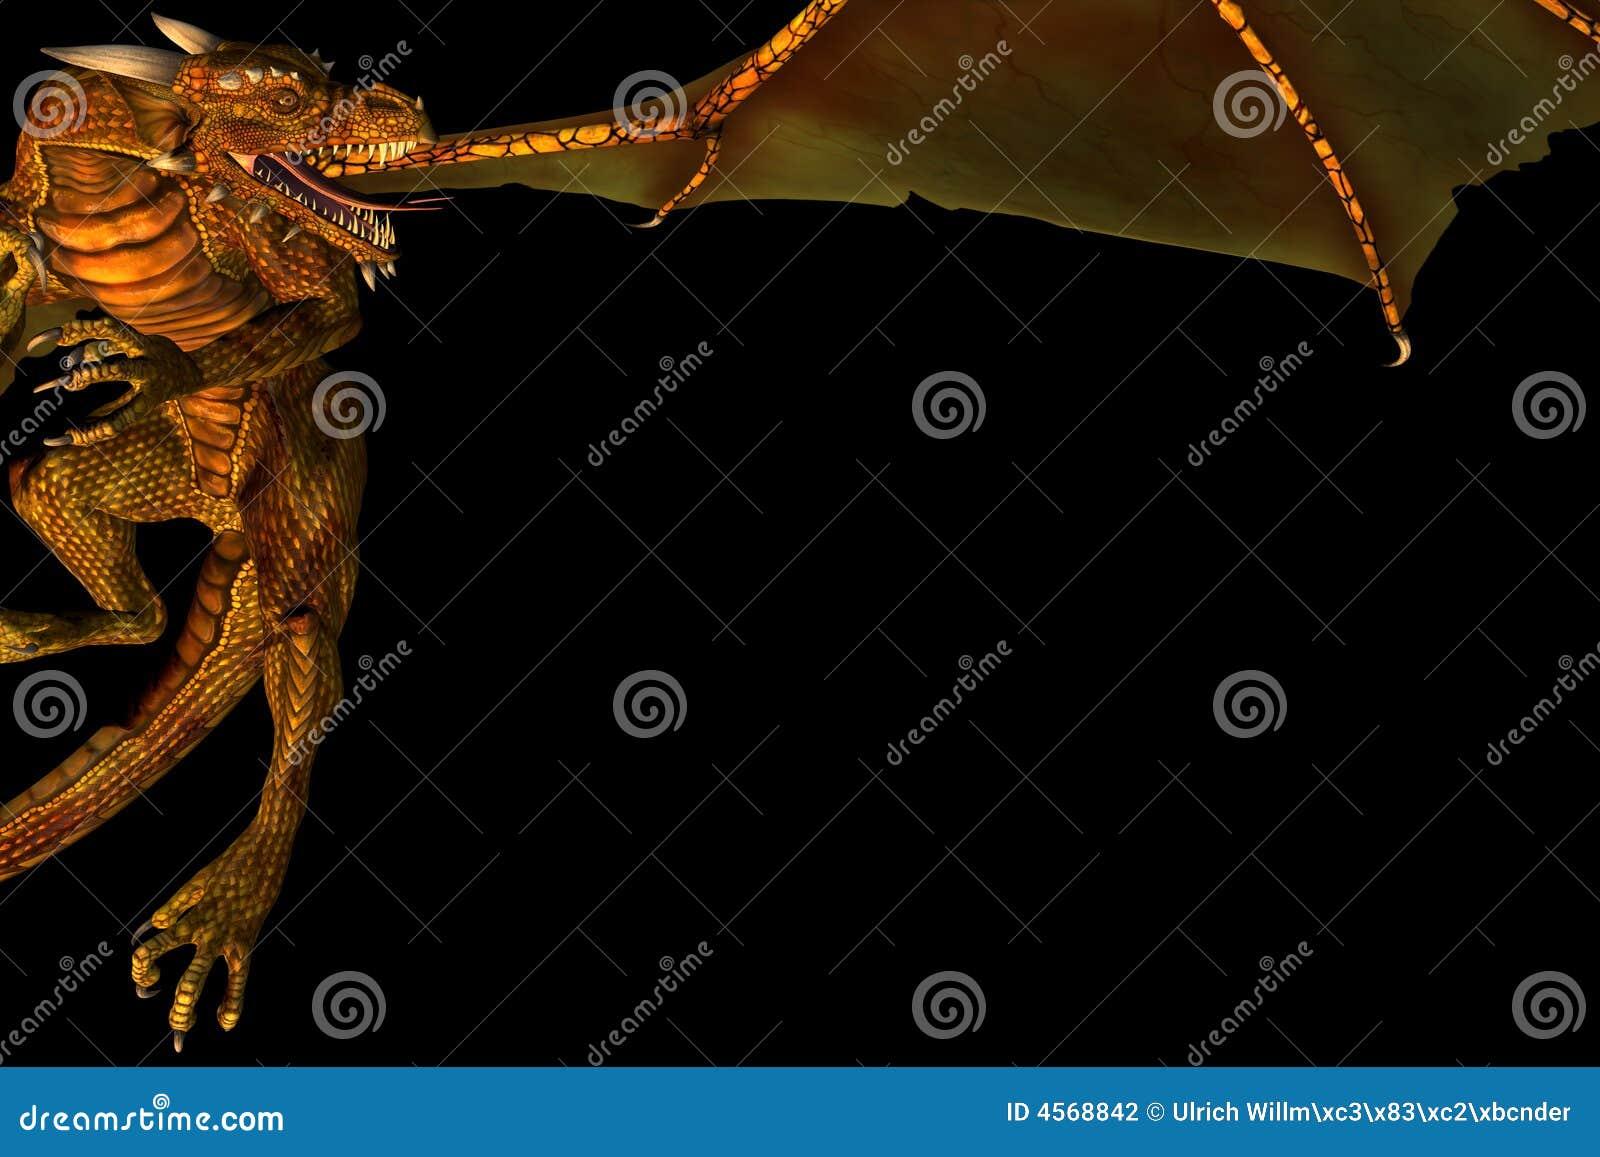 Dragon frame stock illustration. Illustration of myth - 4568842